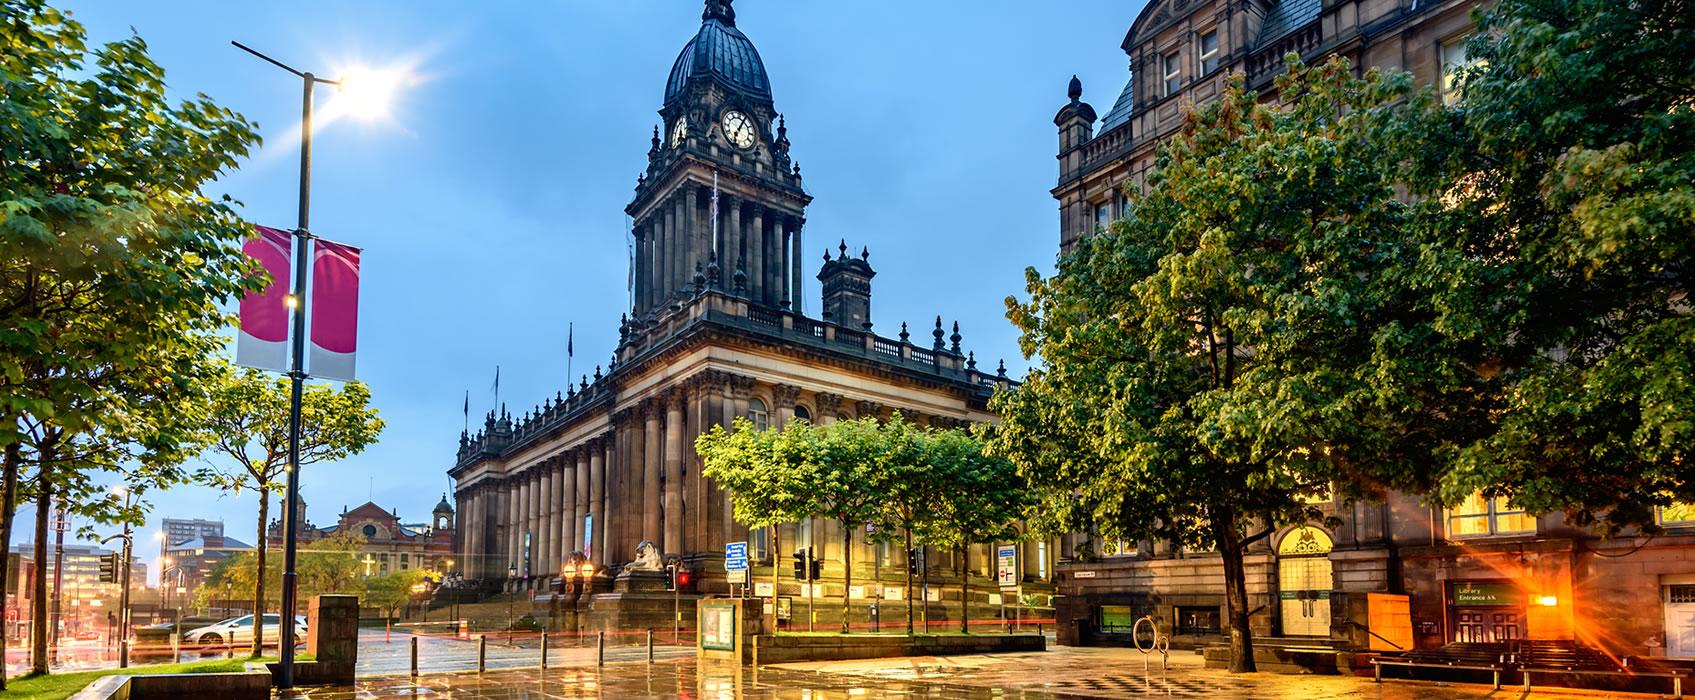 Personal Solicitors in Leeds